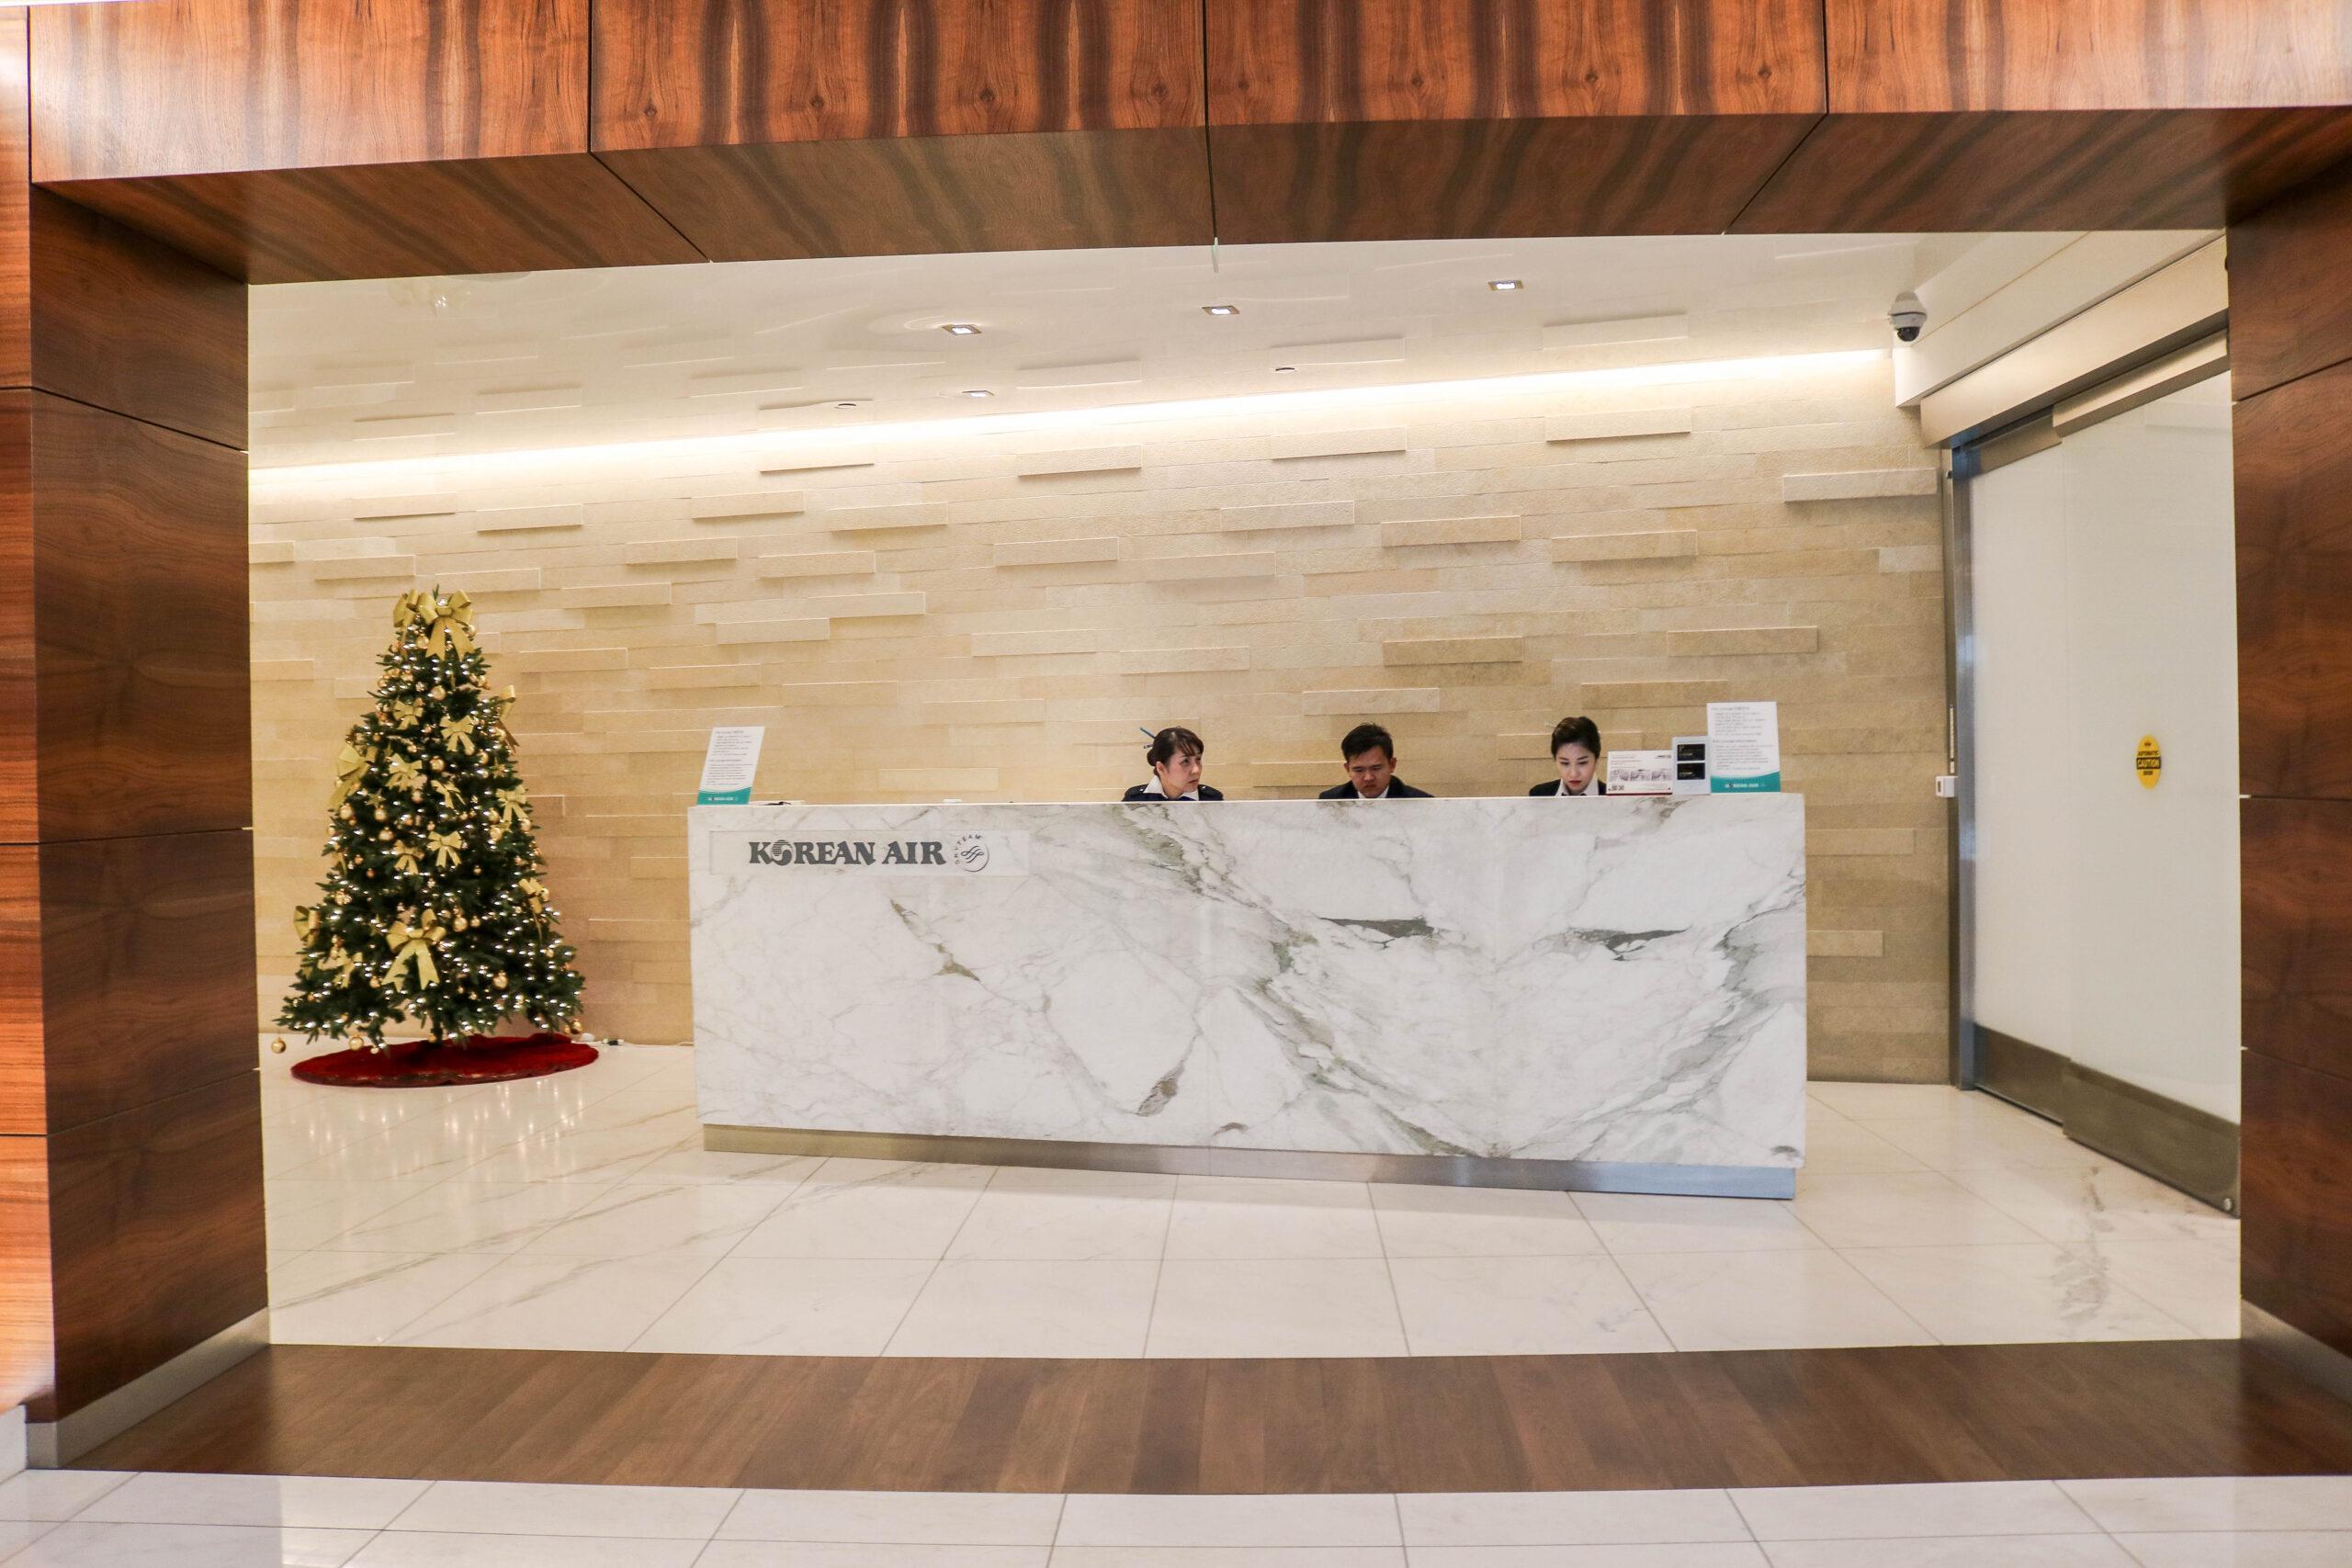 Korean Air Business Class Lounge at LAX Airport